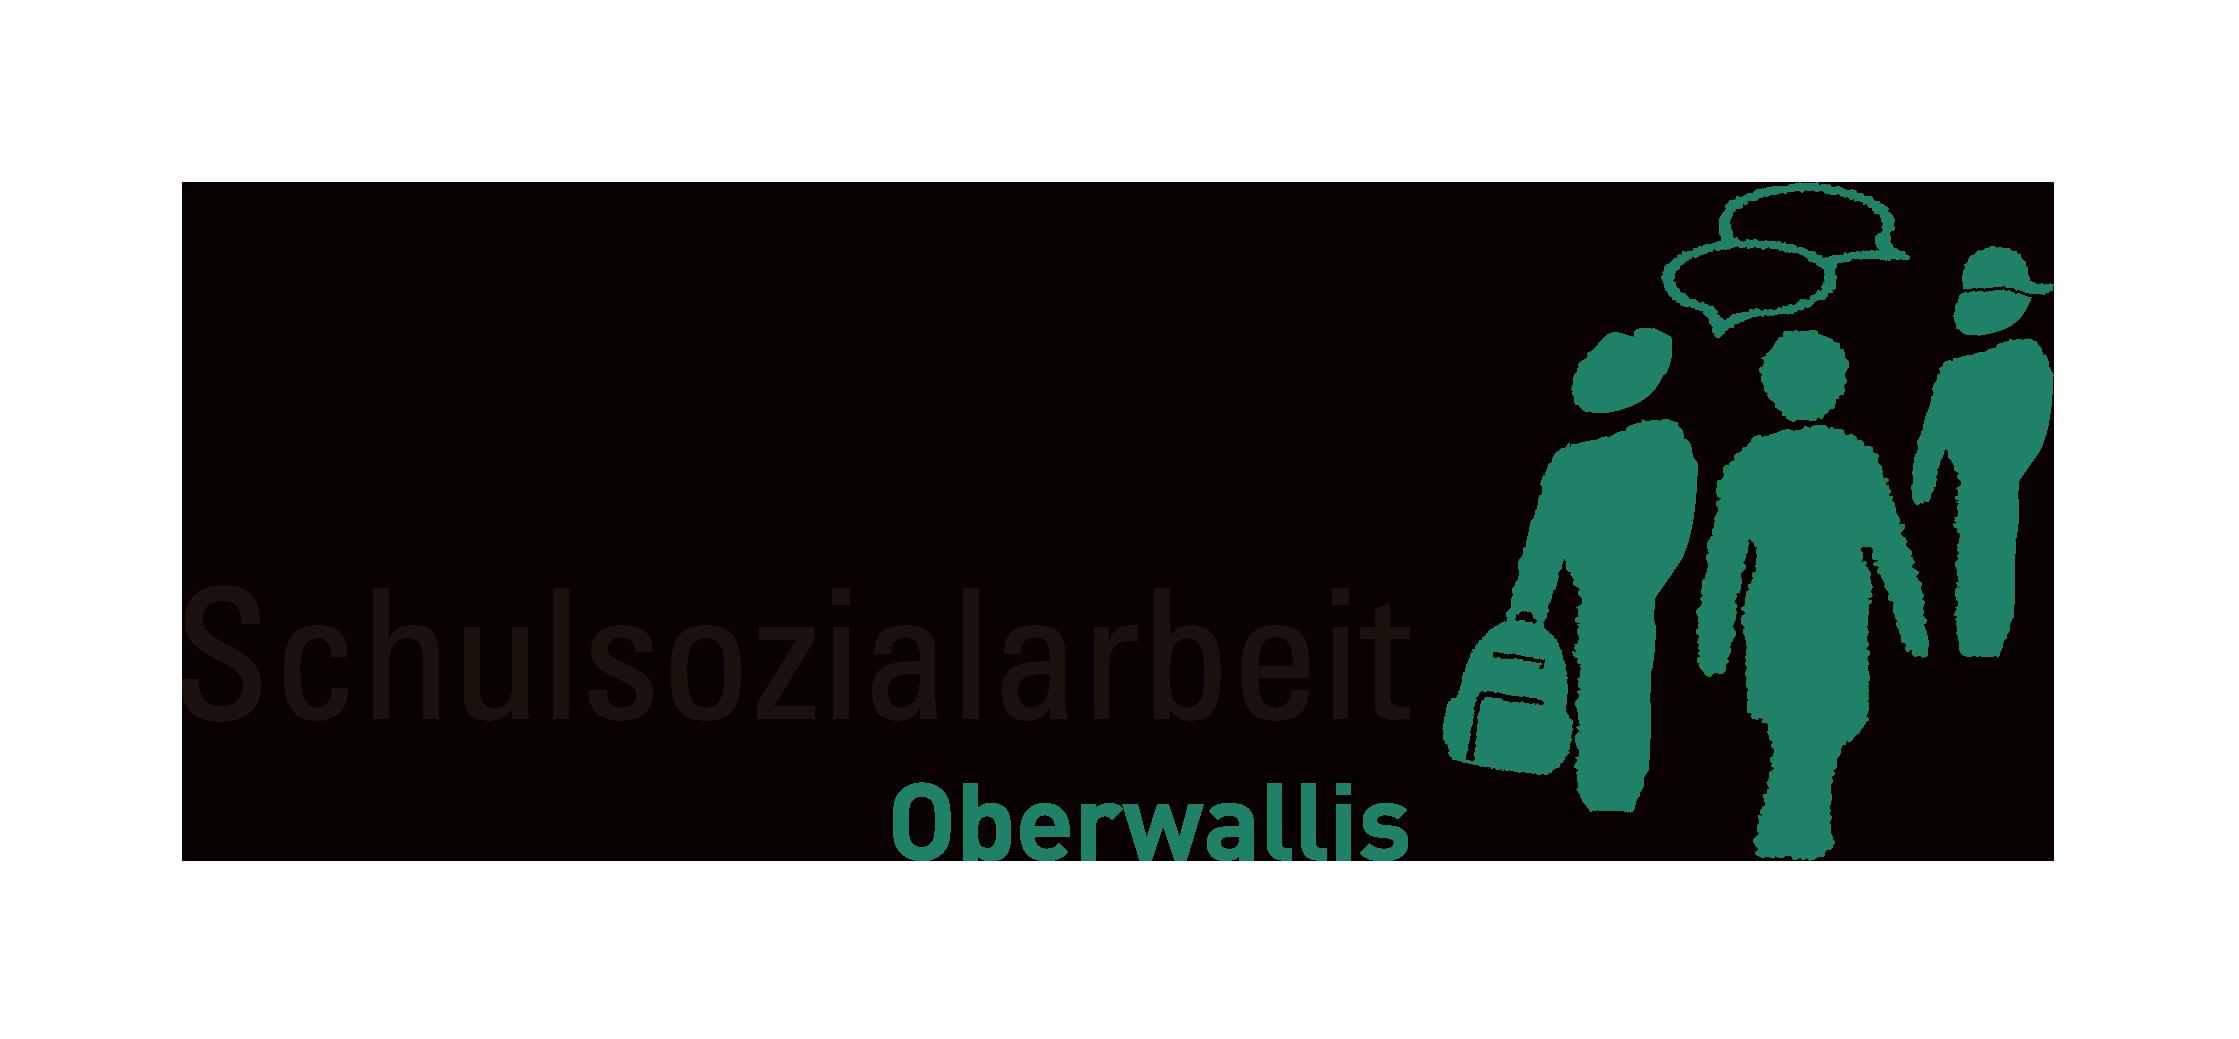 Schulsozialarbeit Oberwallis